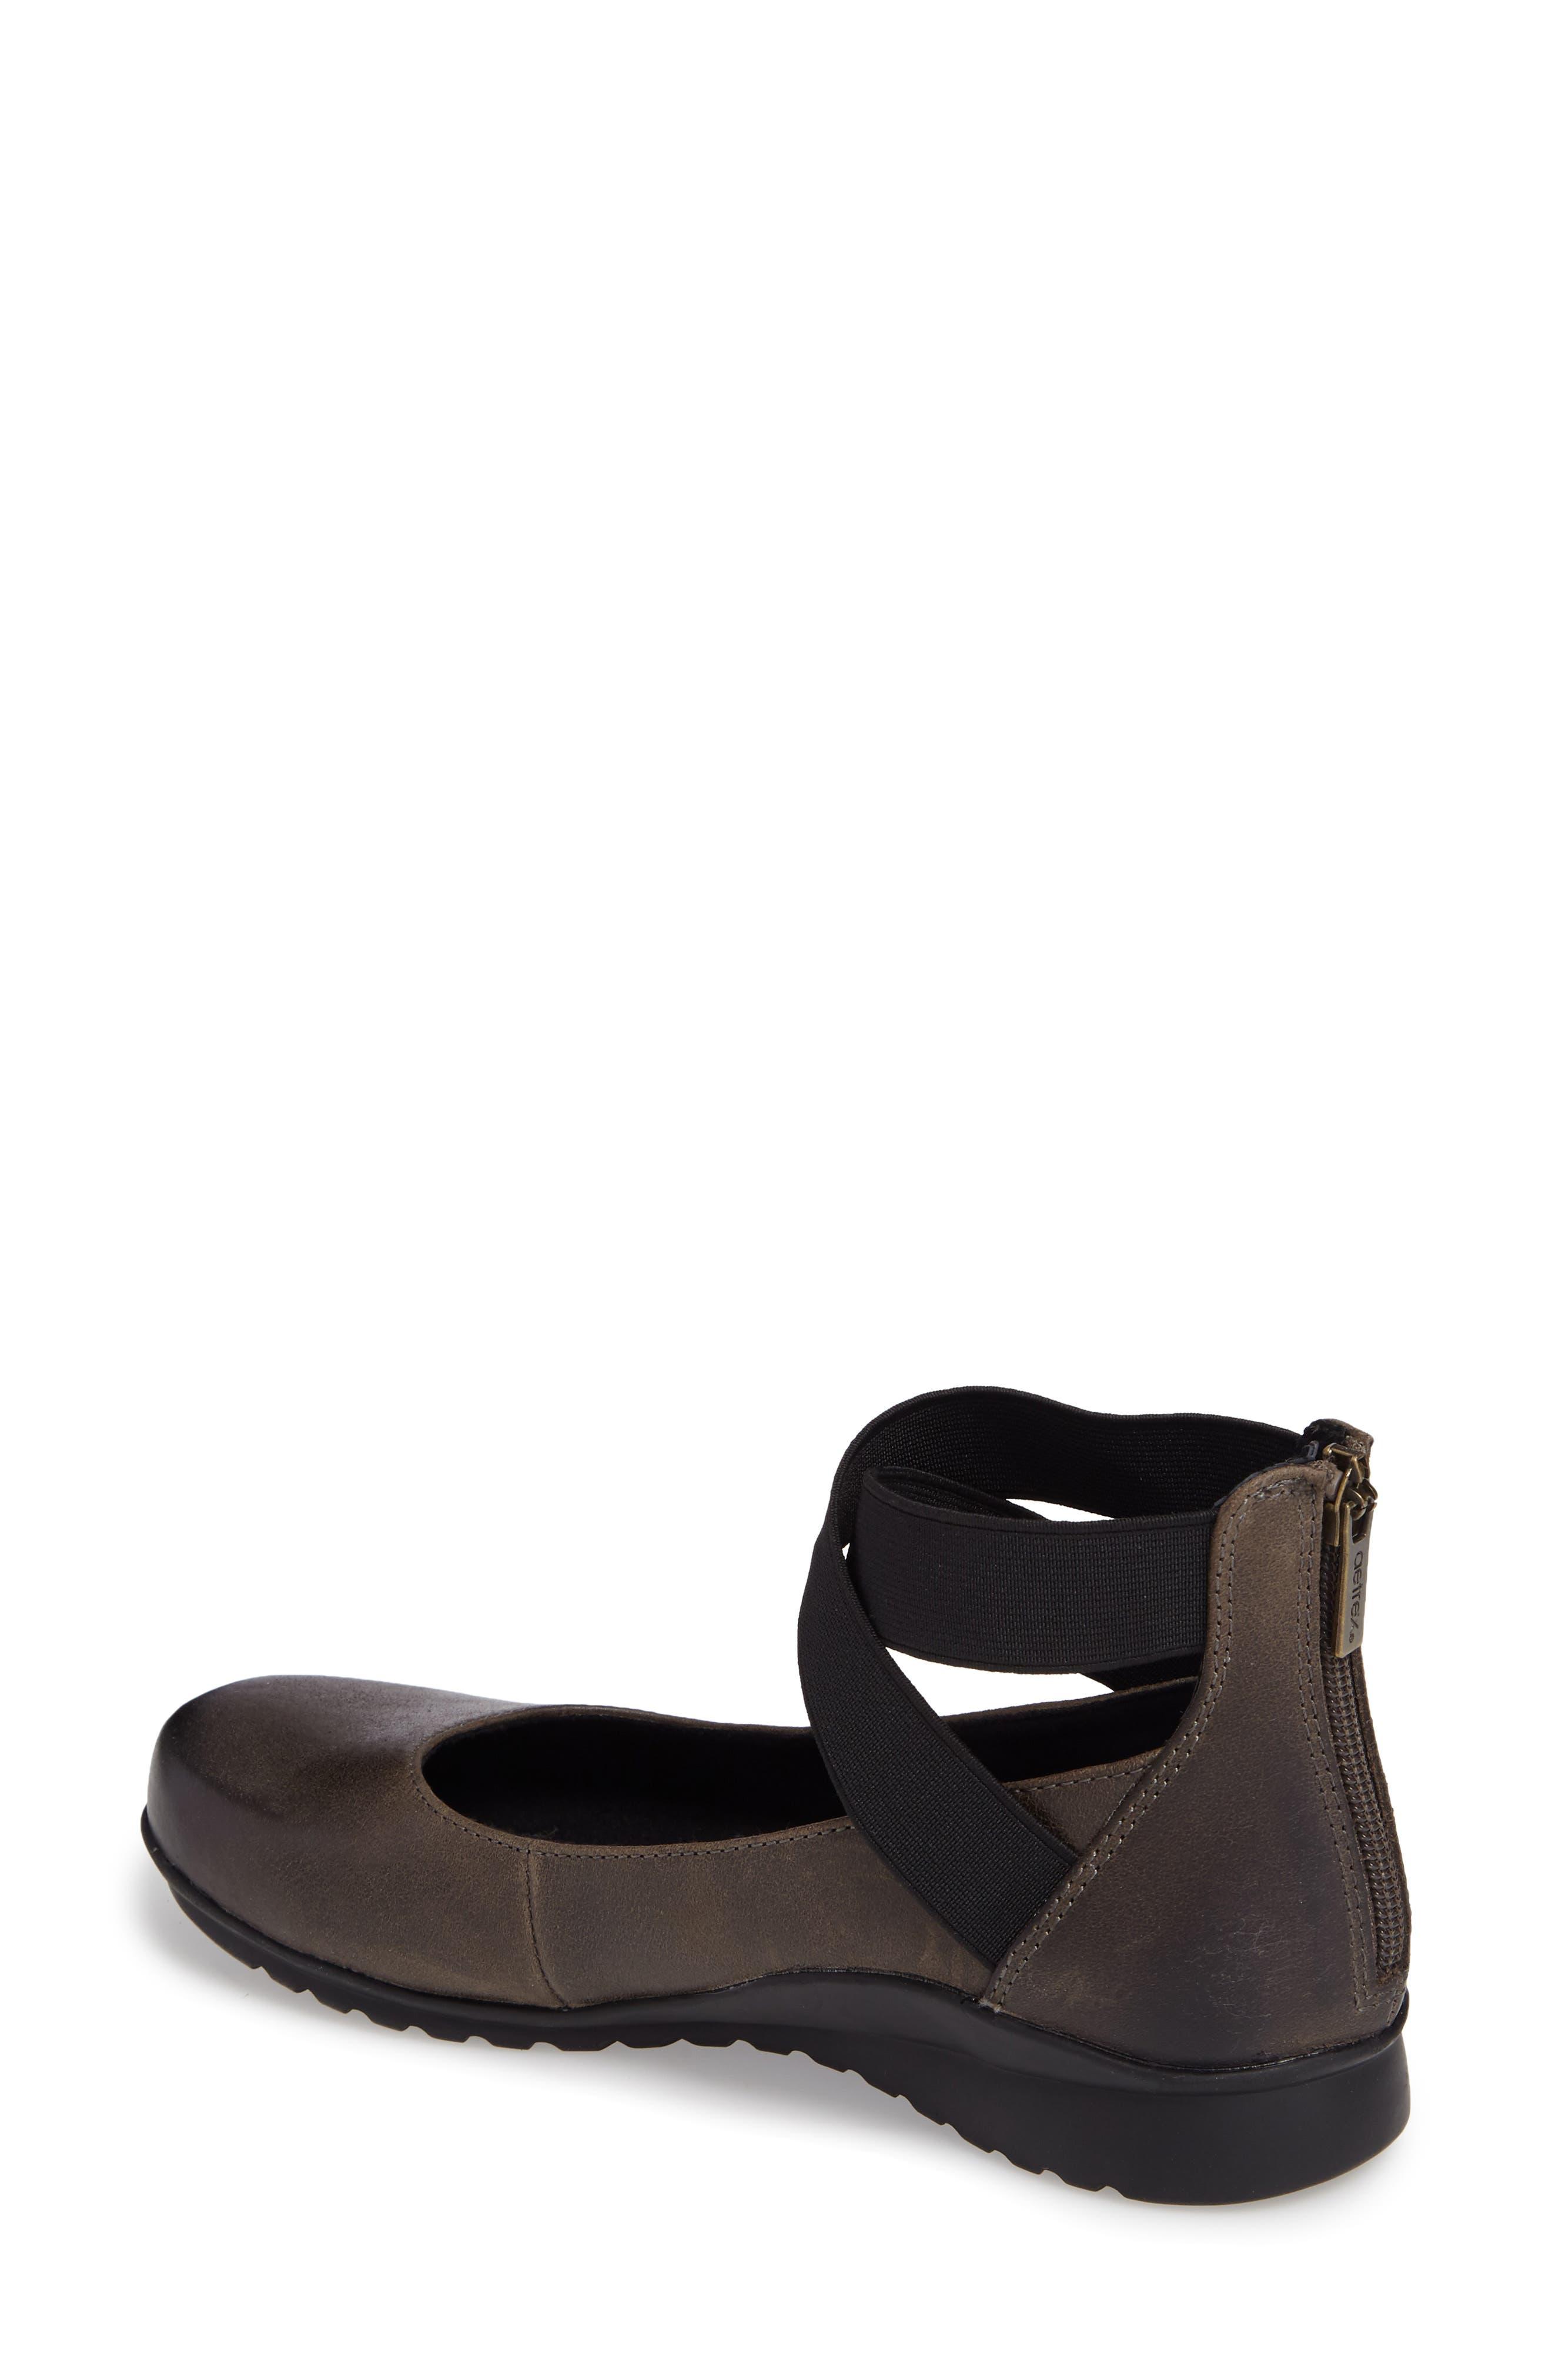 AETREX, 'Dakota' Ankle Strap Ballet Flat, Alternate thumbnail 2, color, 021